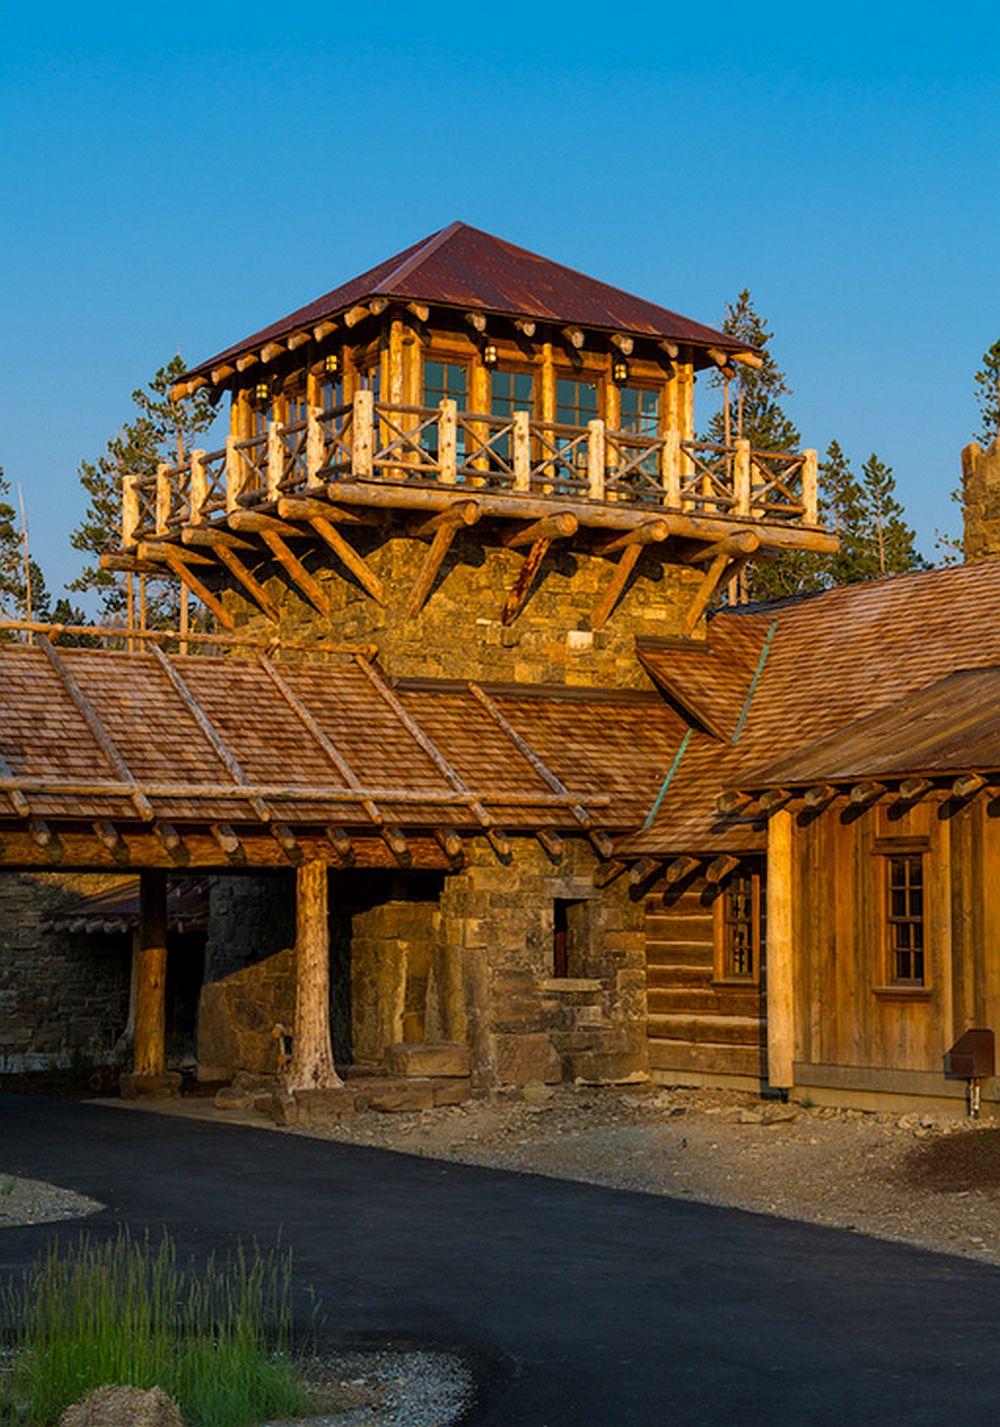 adelaparvu.com about Foxtail residence in Yellowstone Club, Big Sky, Montana, architect Faure Halvorsen Architects, Photo Karl Neumann (1)